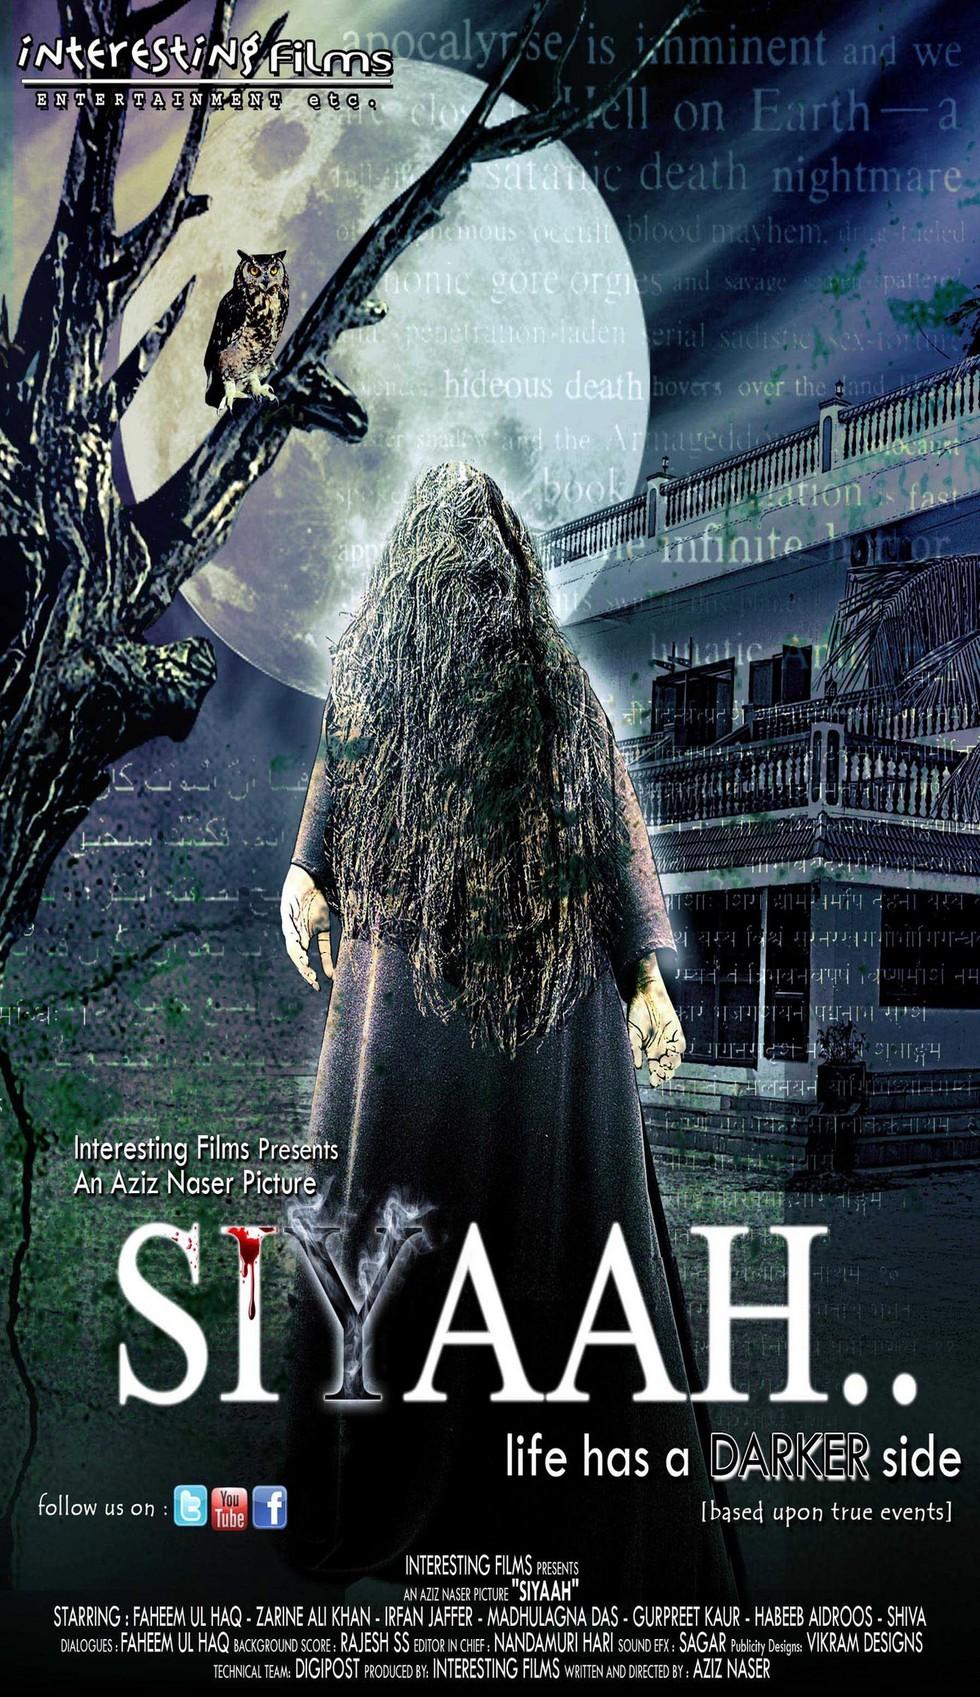 Siyaah.. - Movie Poster #2 (Large)